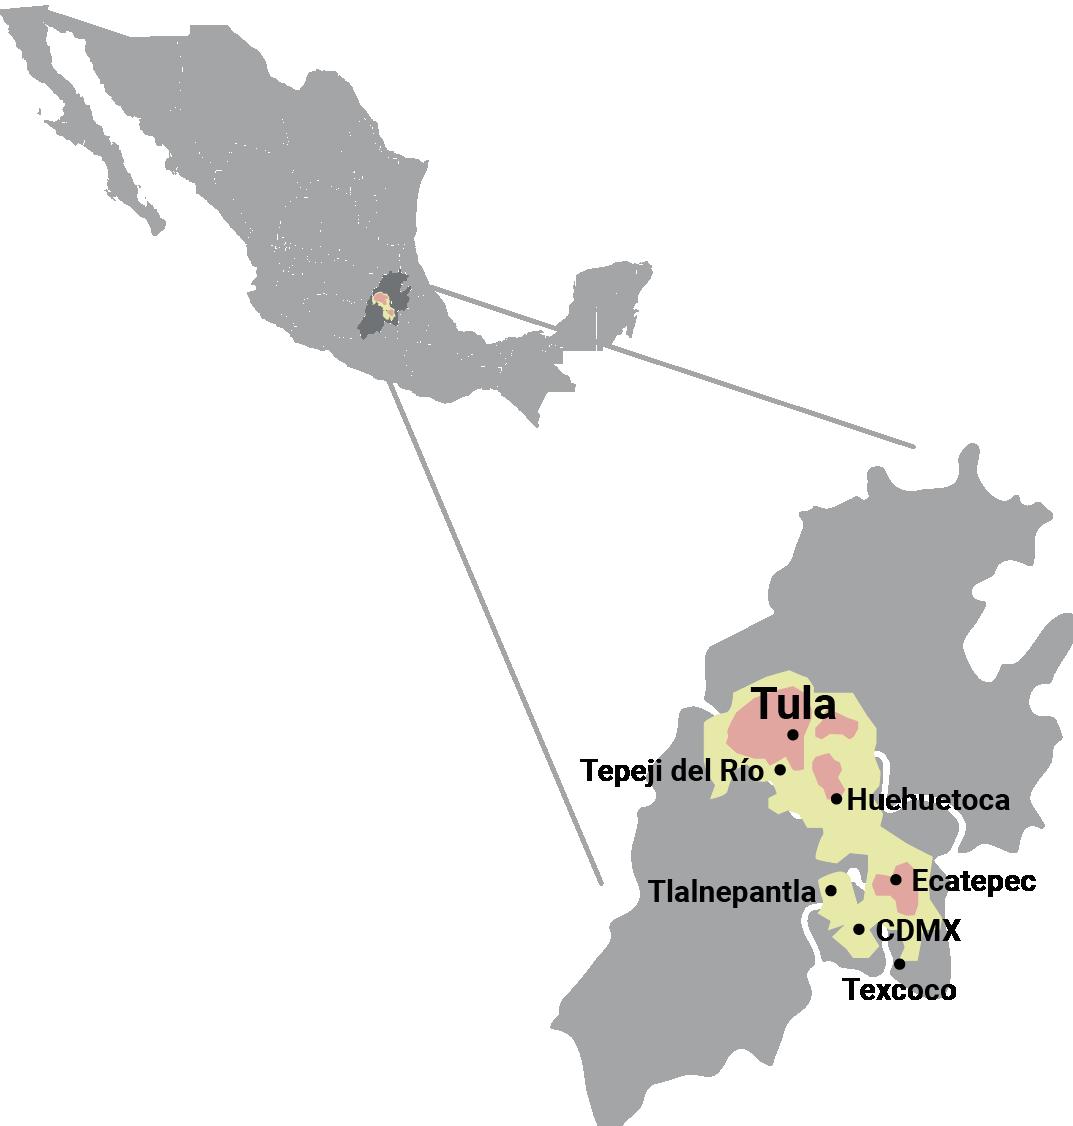 Tula Hidalgo